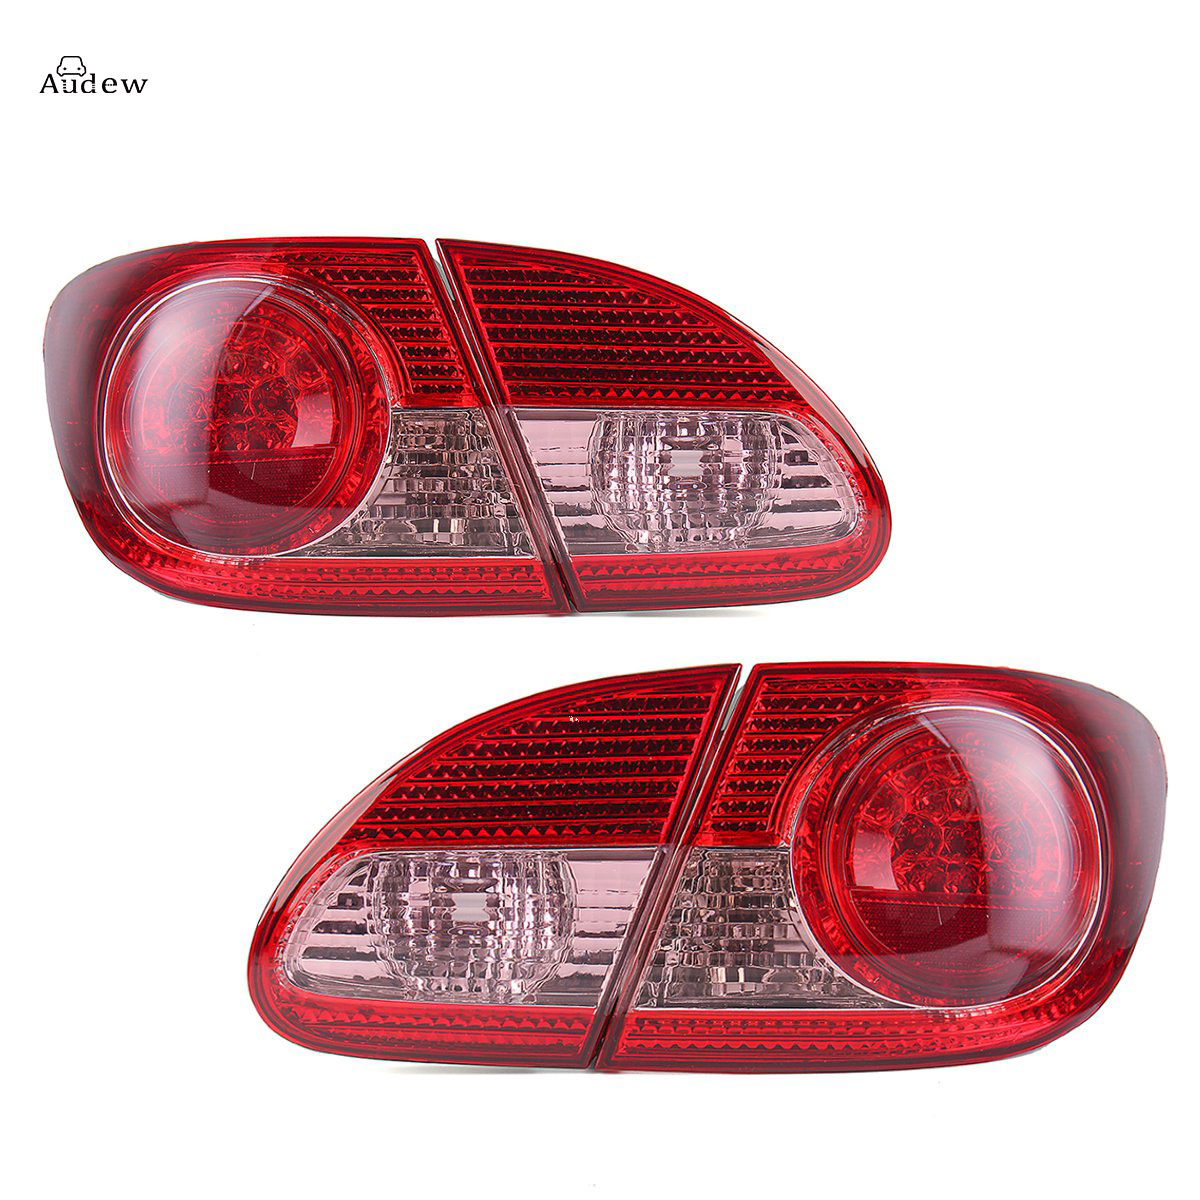 1 Pair Turn Signal Light Fog Lights Rear Bumper Rear Red Brake Tail Light for Toyota Corolla 2003-2008 #TO2800144 TO2801144 toyota rear brake pads 04466 02181 for auris blade corolla